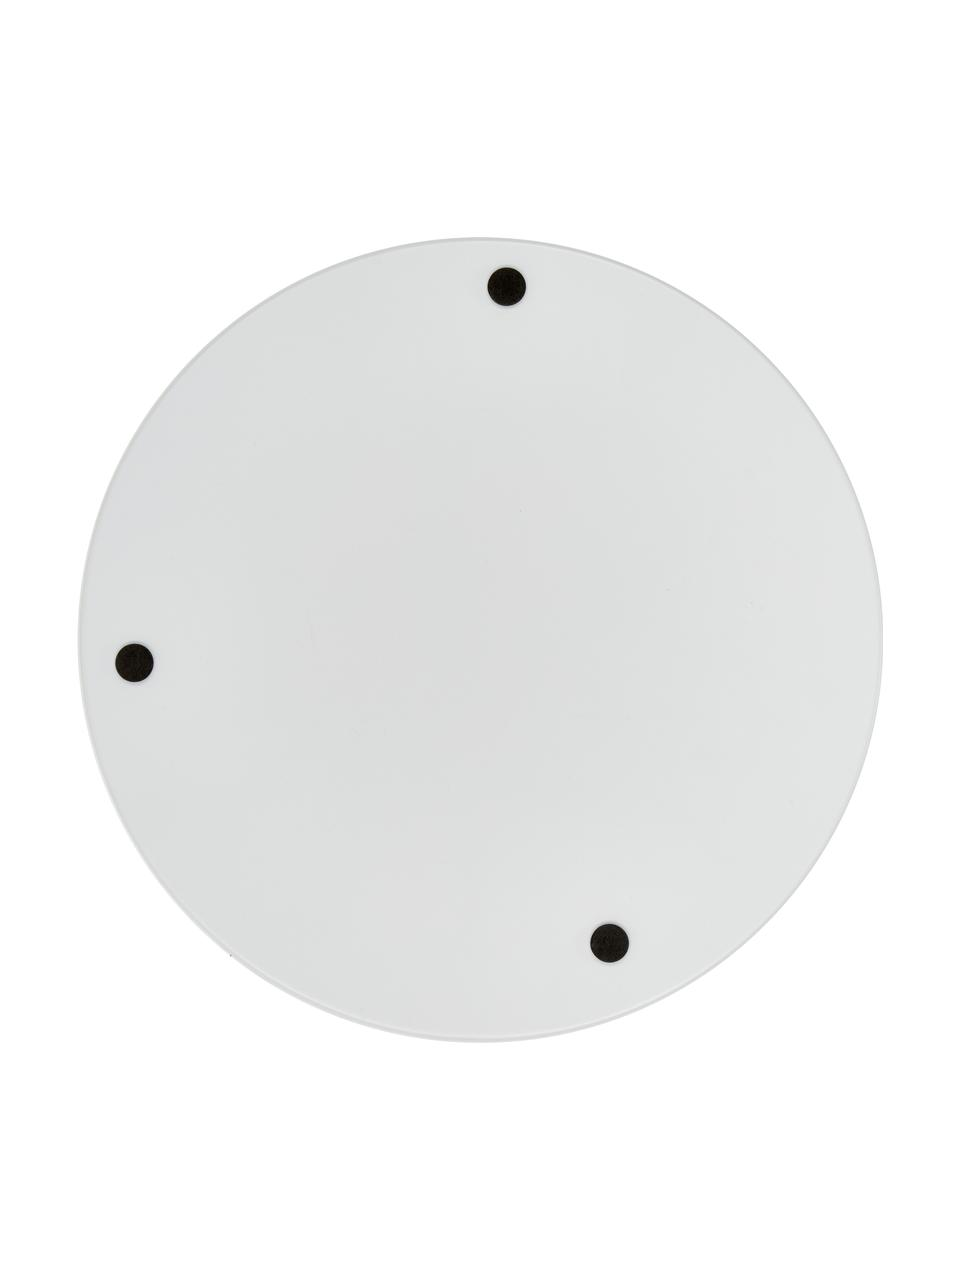 Taca Arla, Metal powlekany, Biały, Ø 41 cm